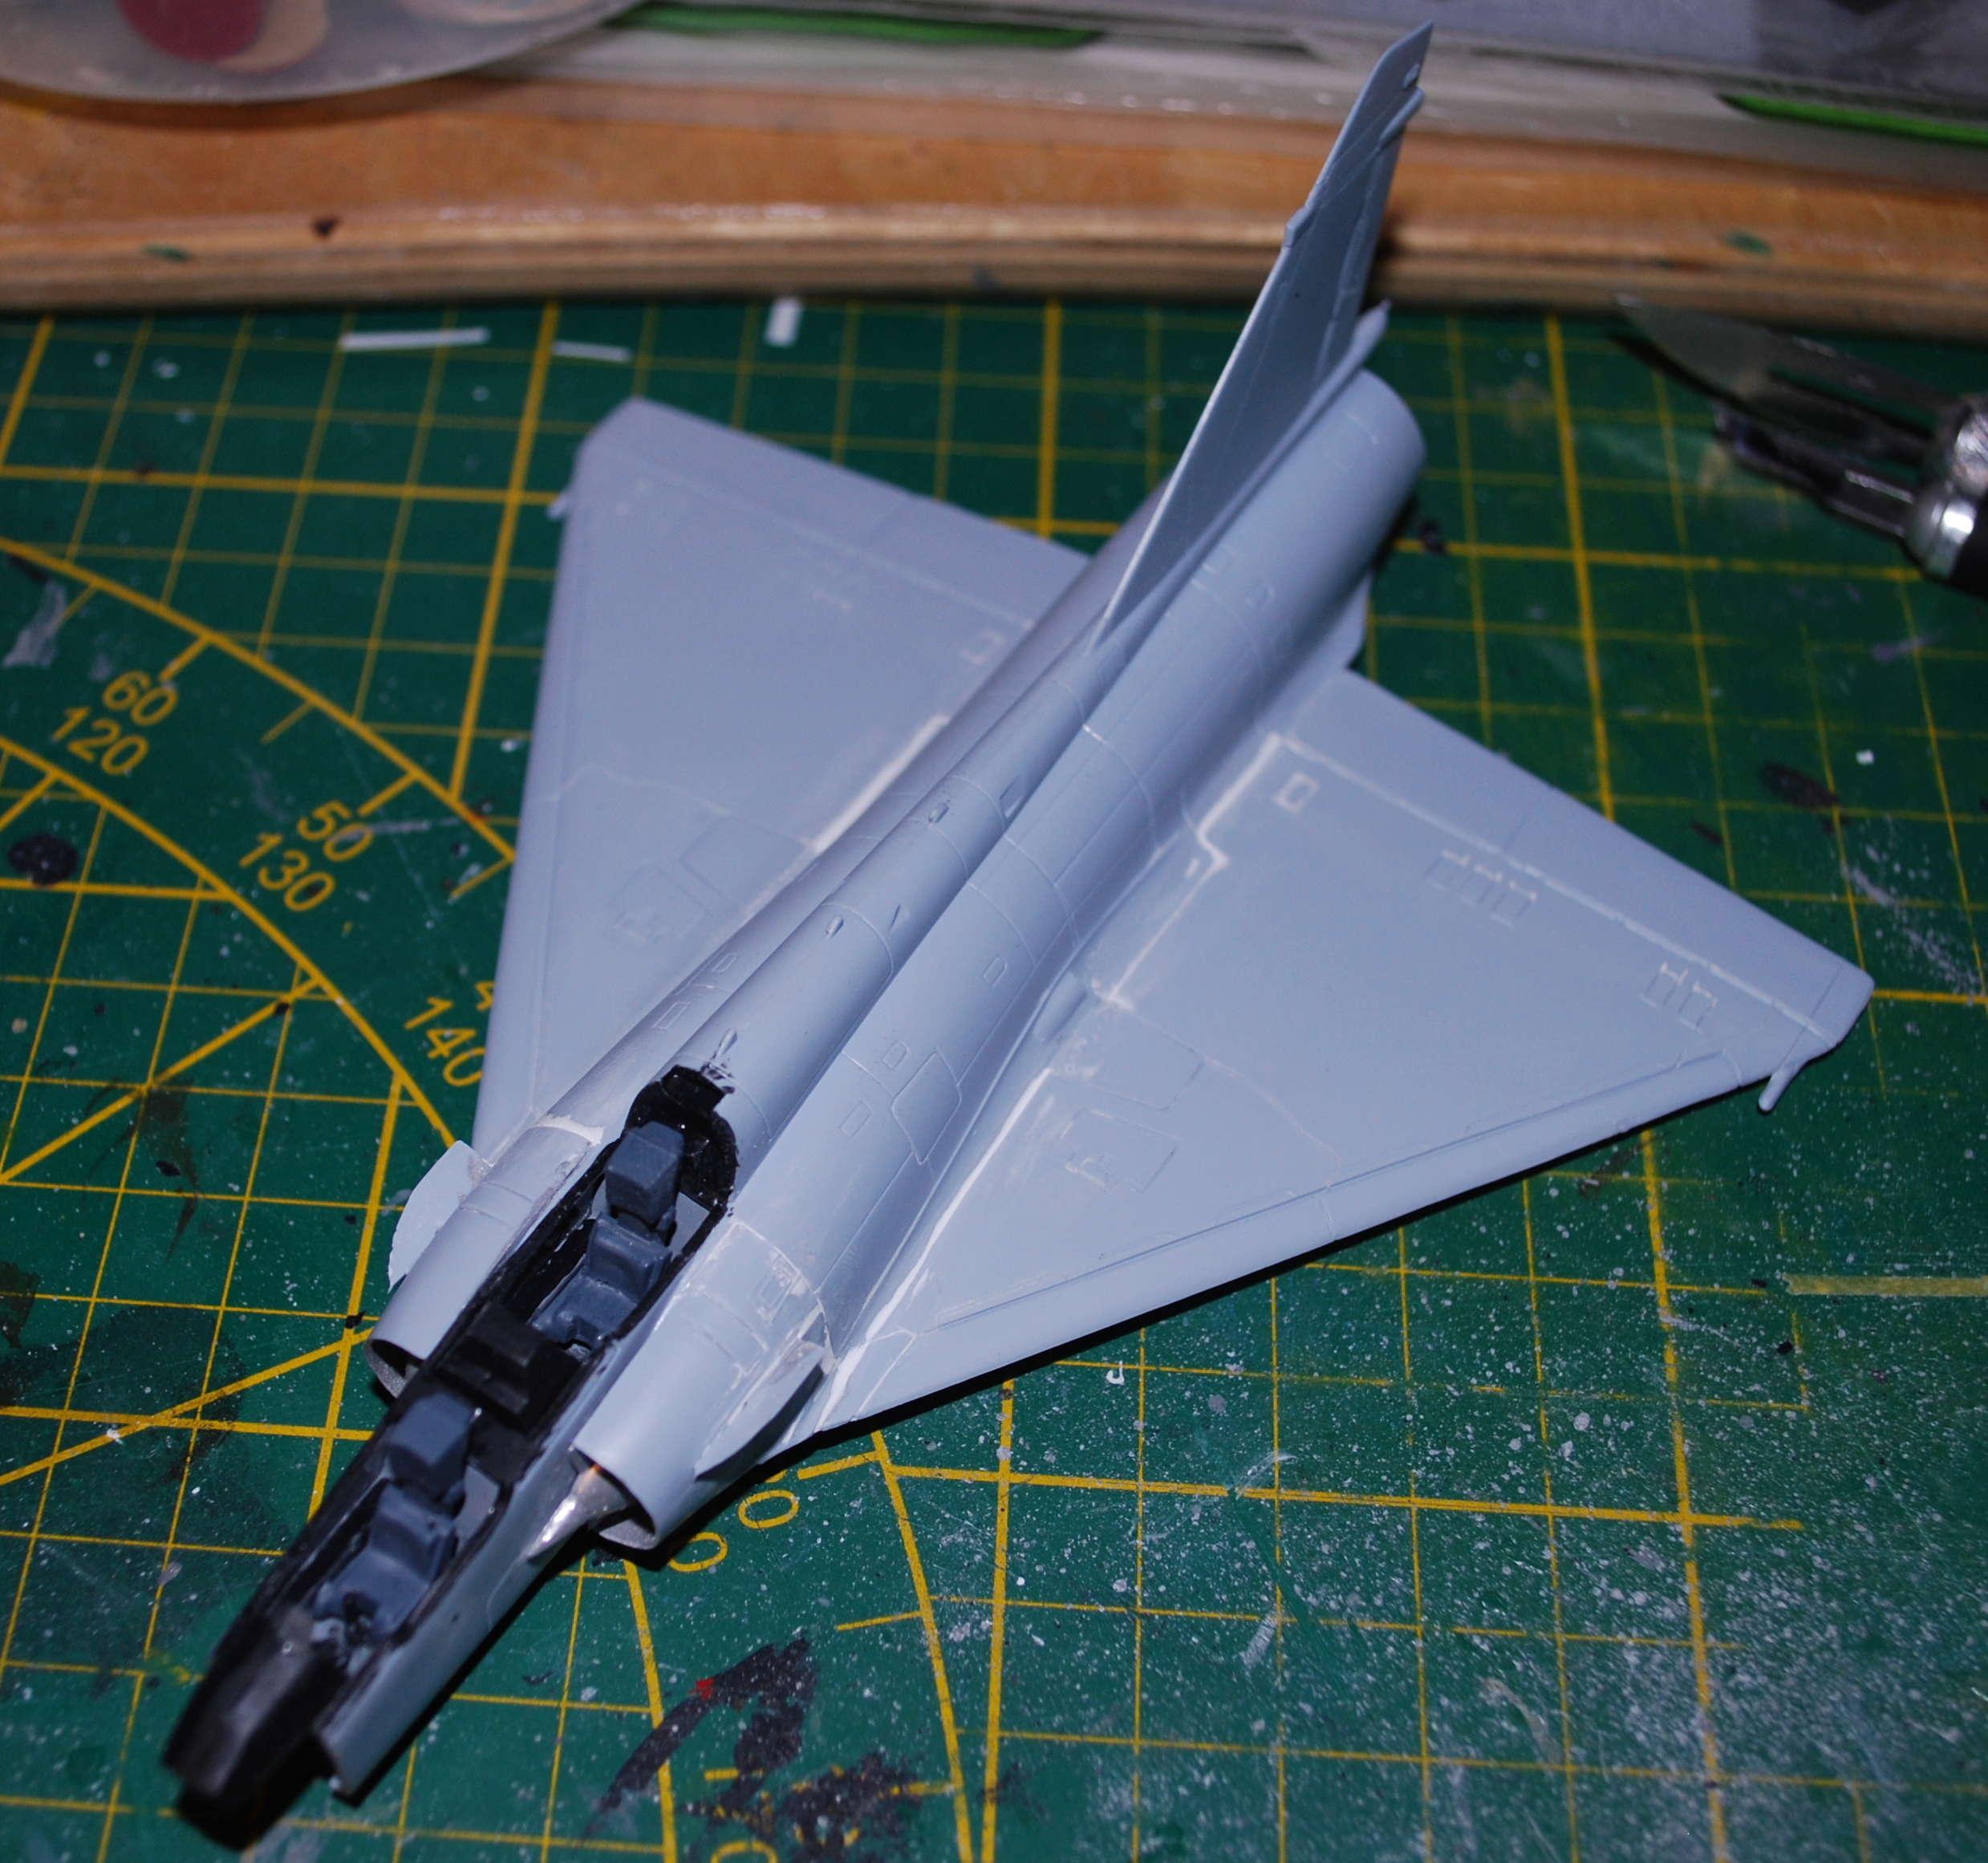 Mirage 2000B Banc d'essai Rafale 1/72 Heller/FFSMC 2017 2000b_18